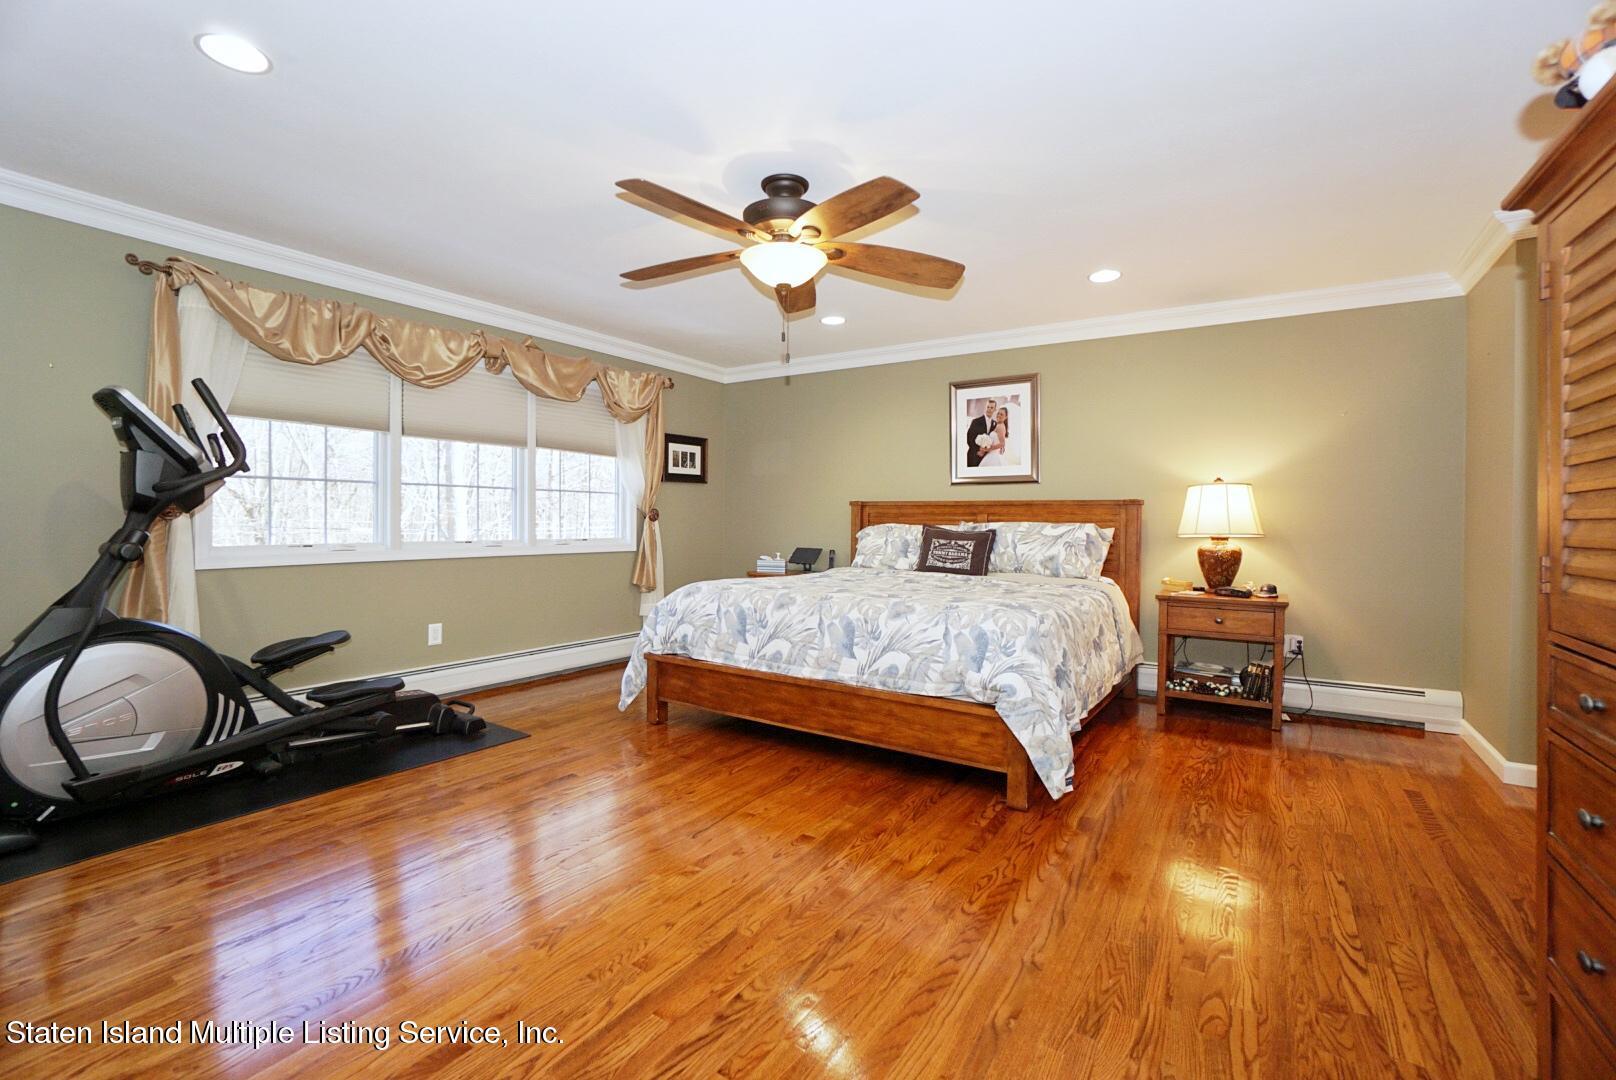 Single Family - Detached 31 Belwood Loop  Staten Island, NY 10307, MLS-1143133-30